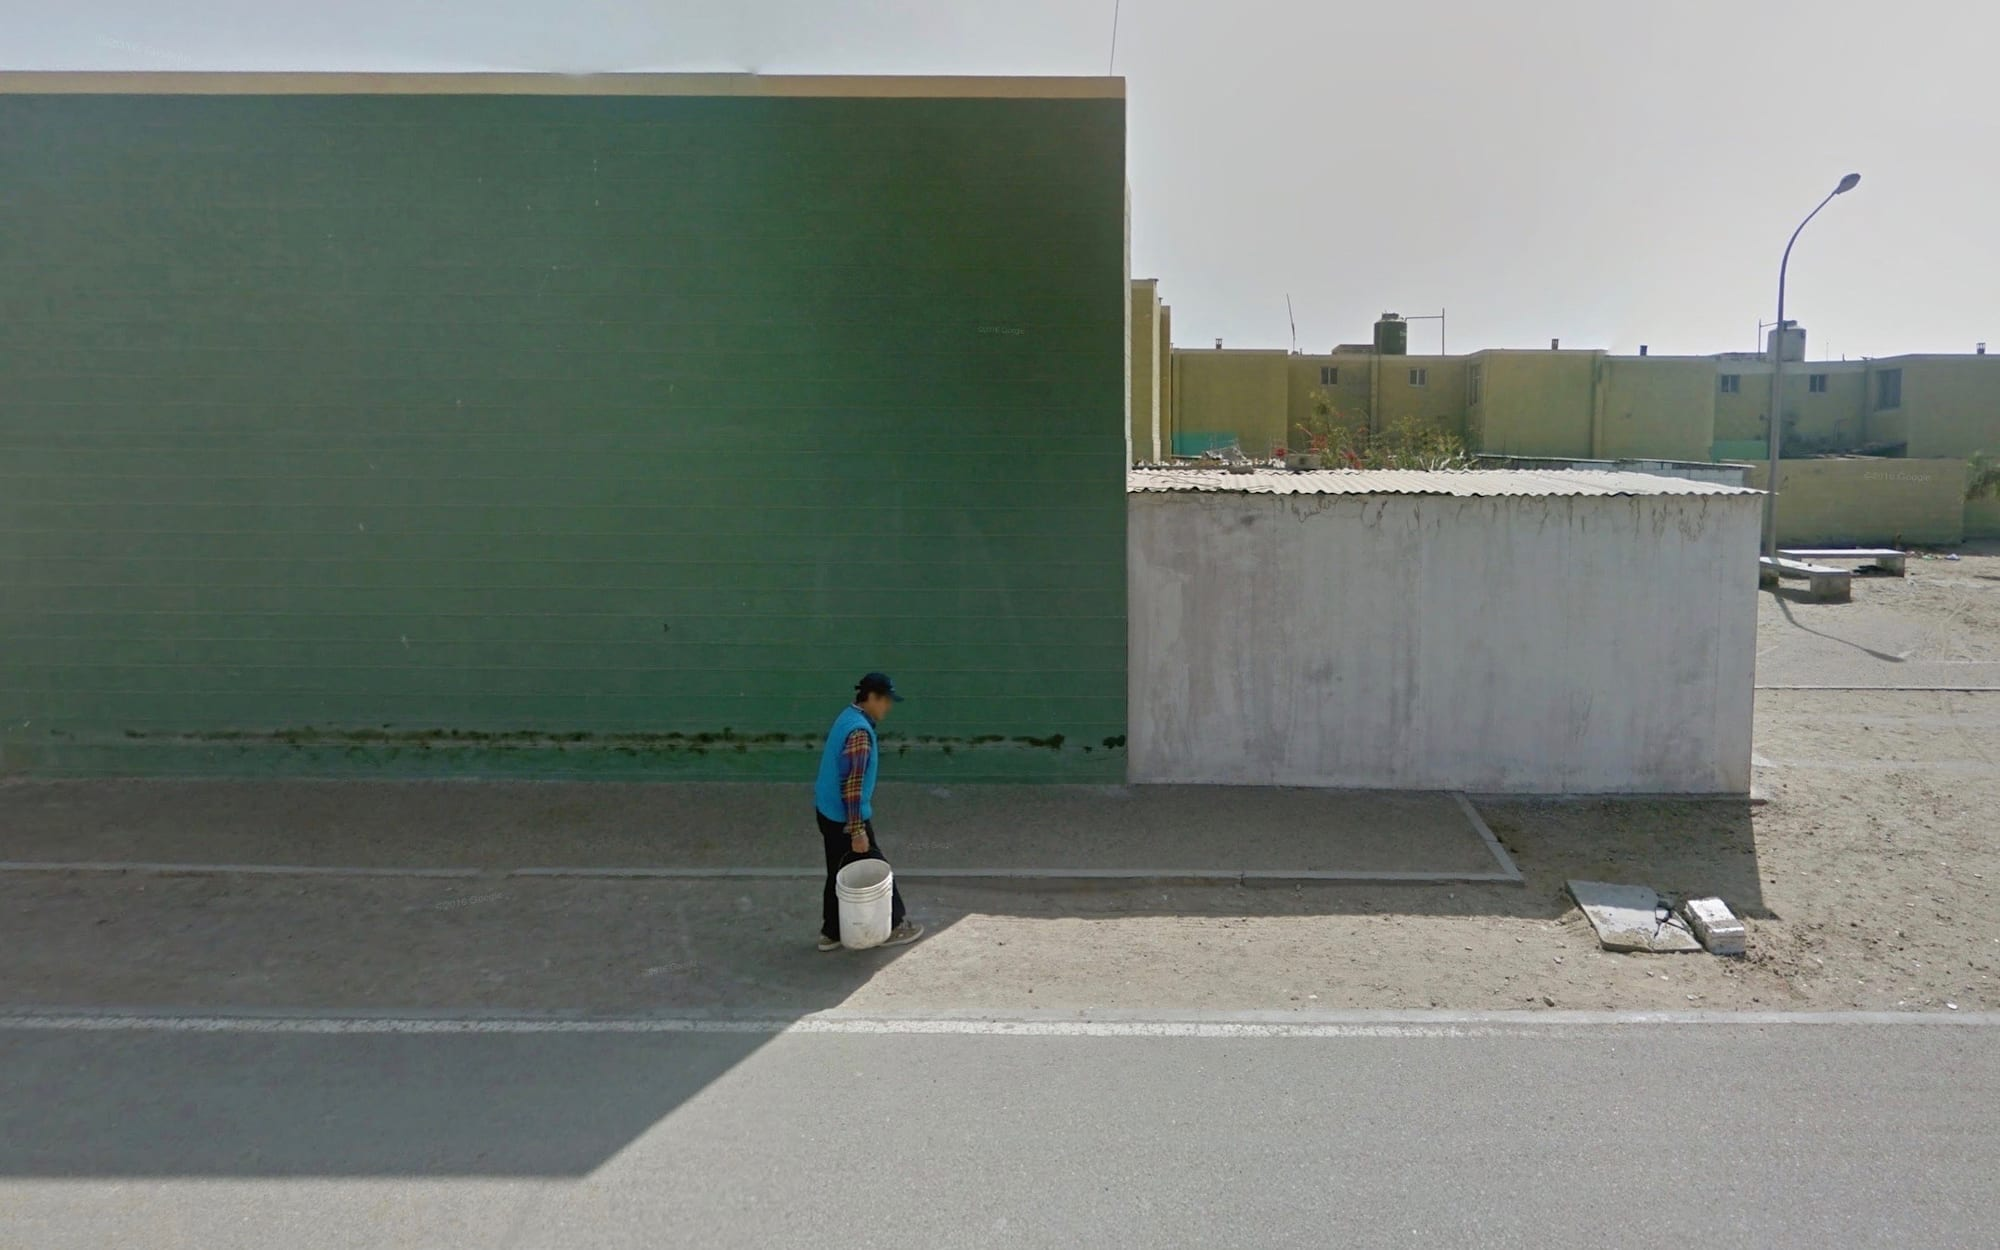 Jacqui Kenny/Google